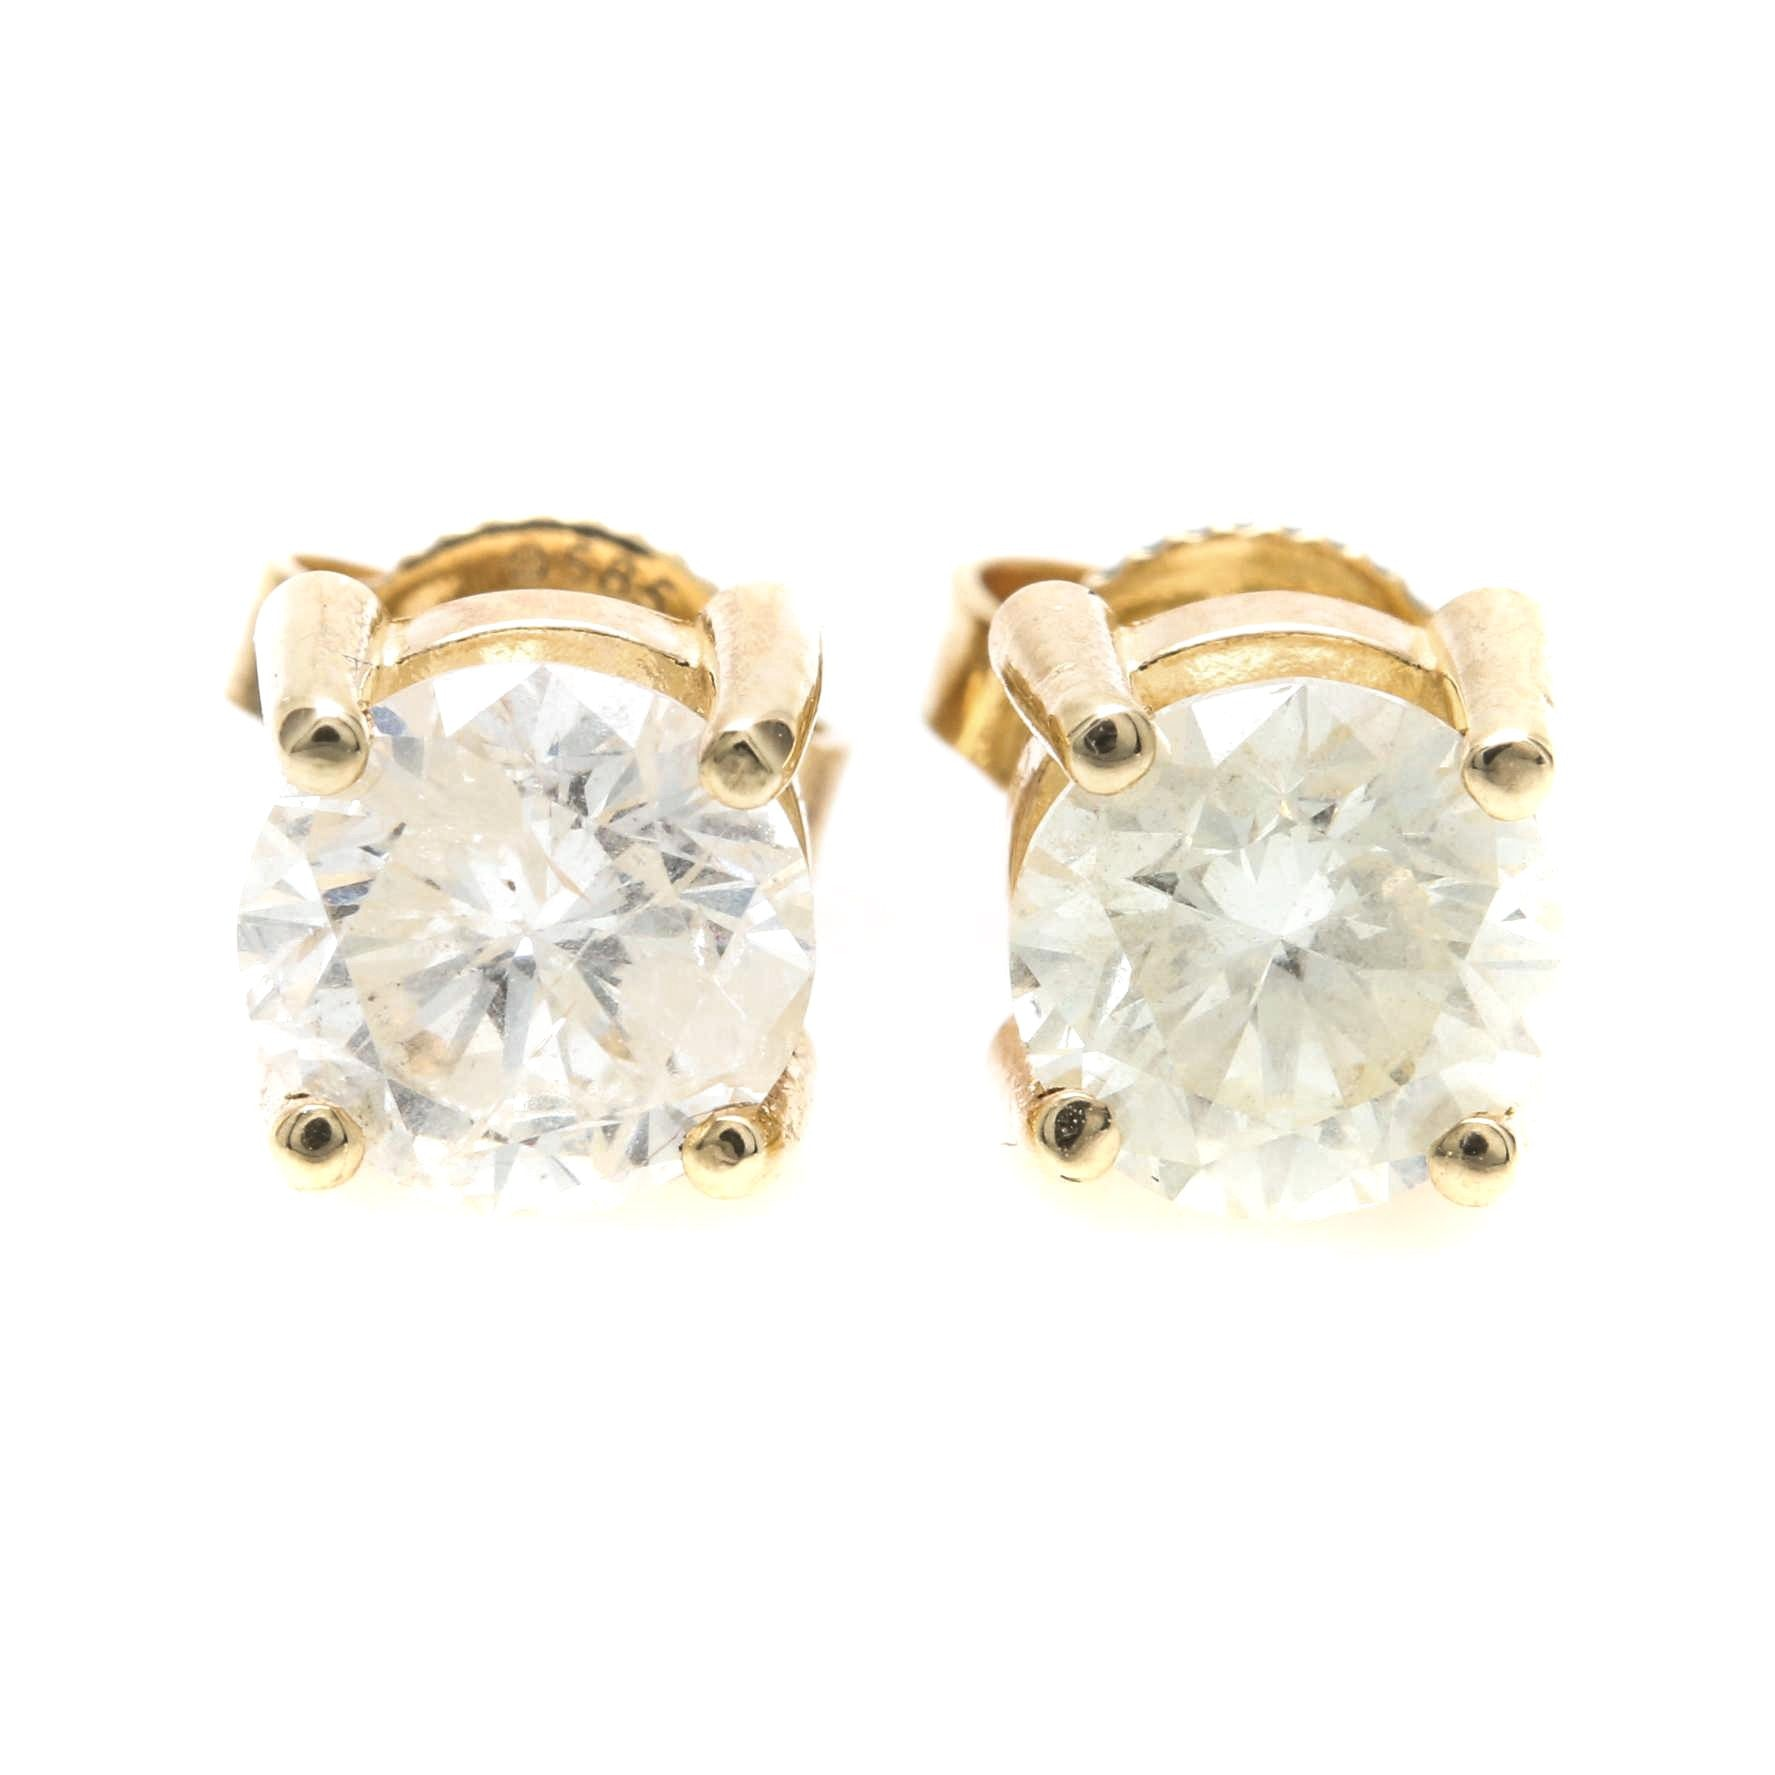 14K Yellow Gold 1.38 CTW Diamond Stud Earrings